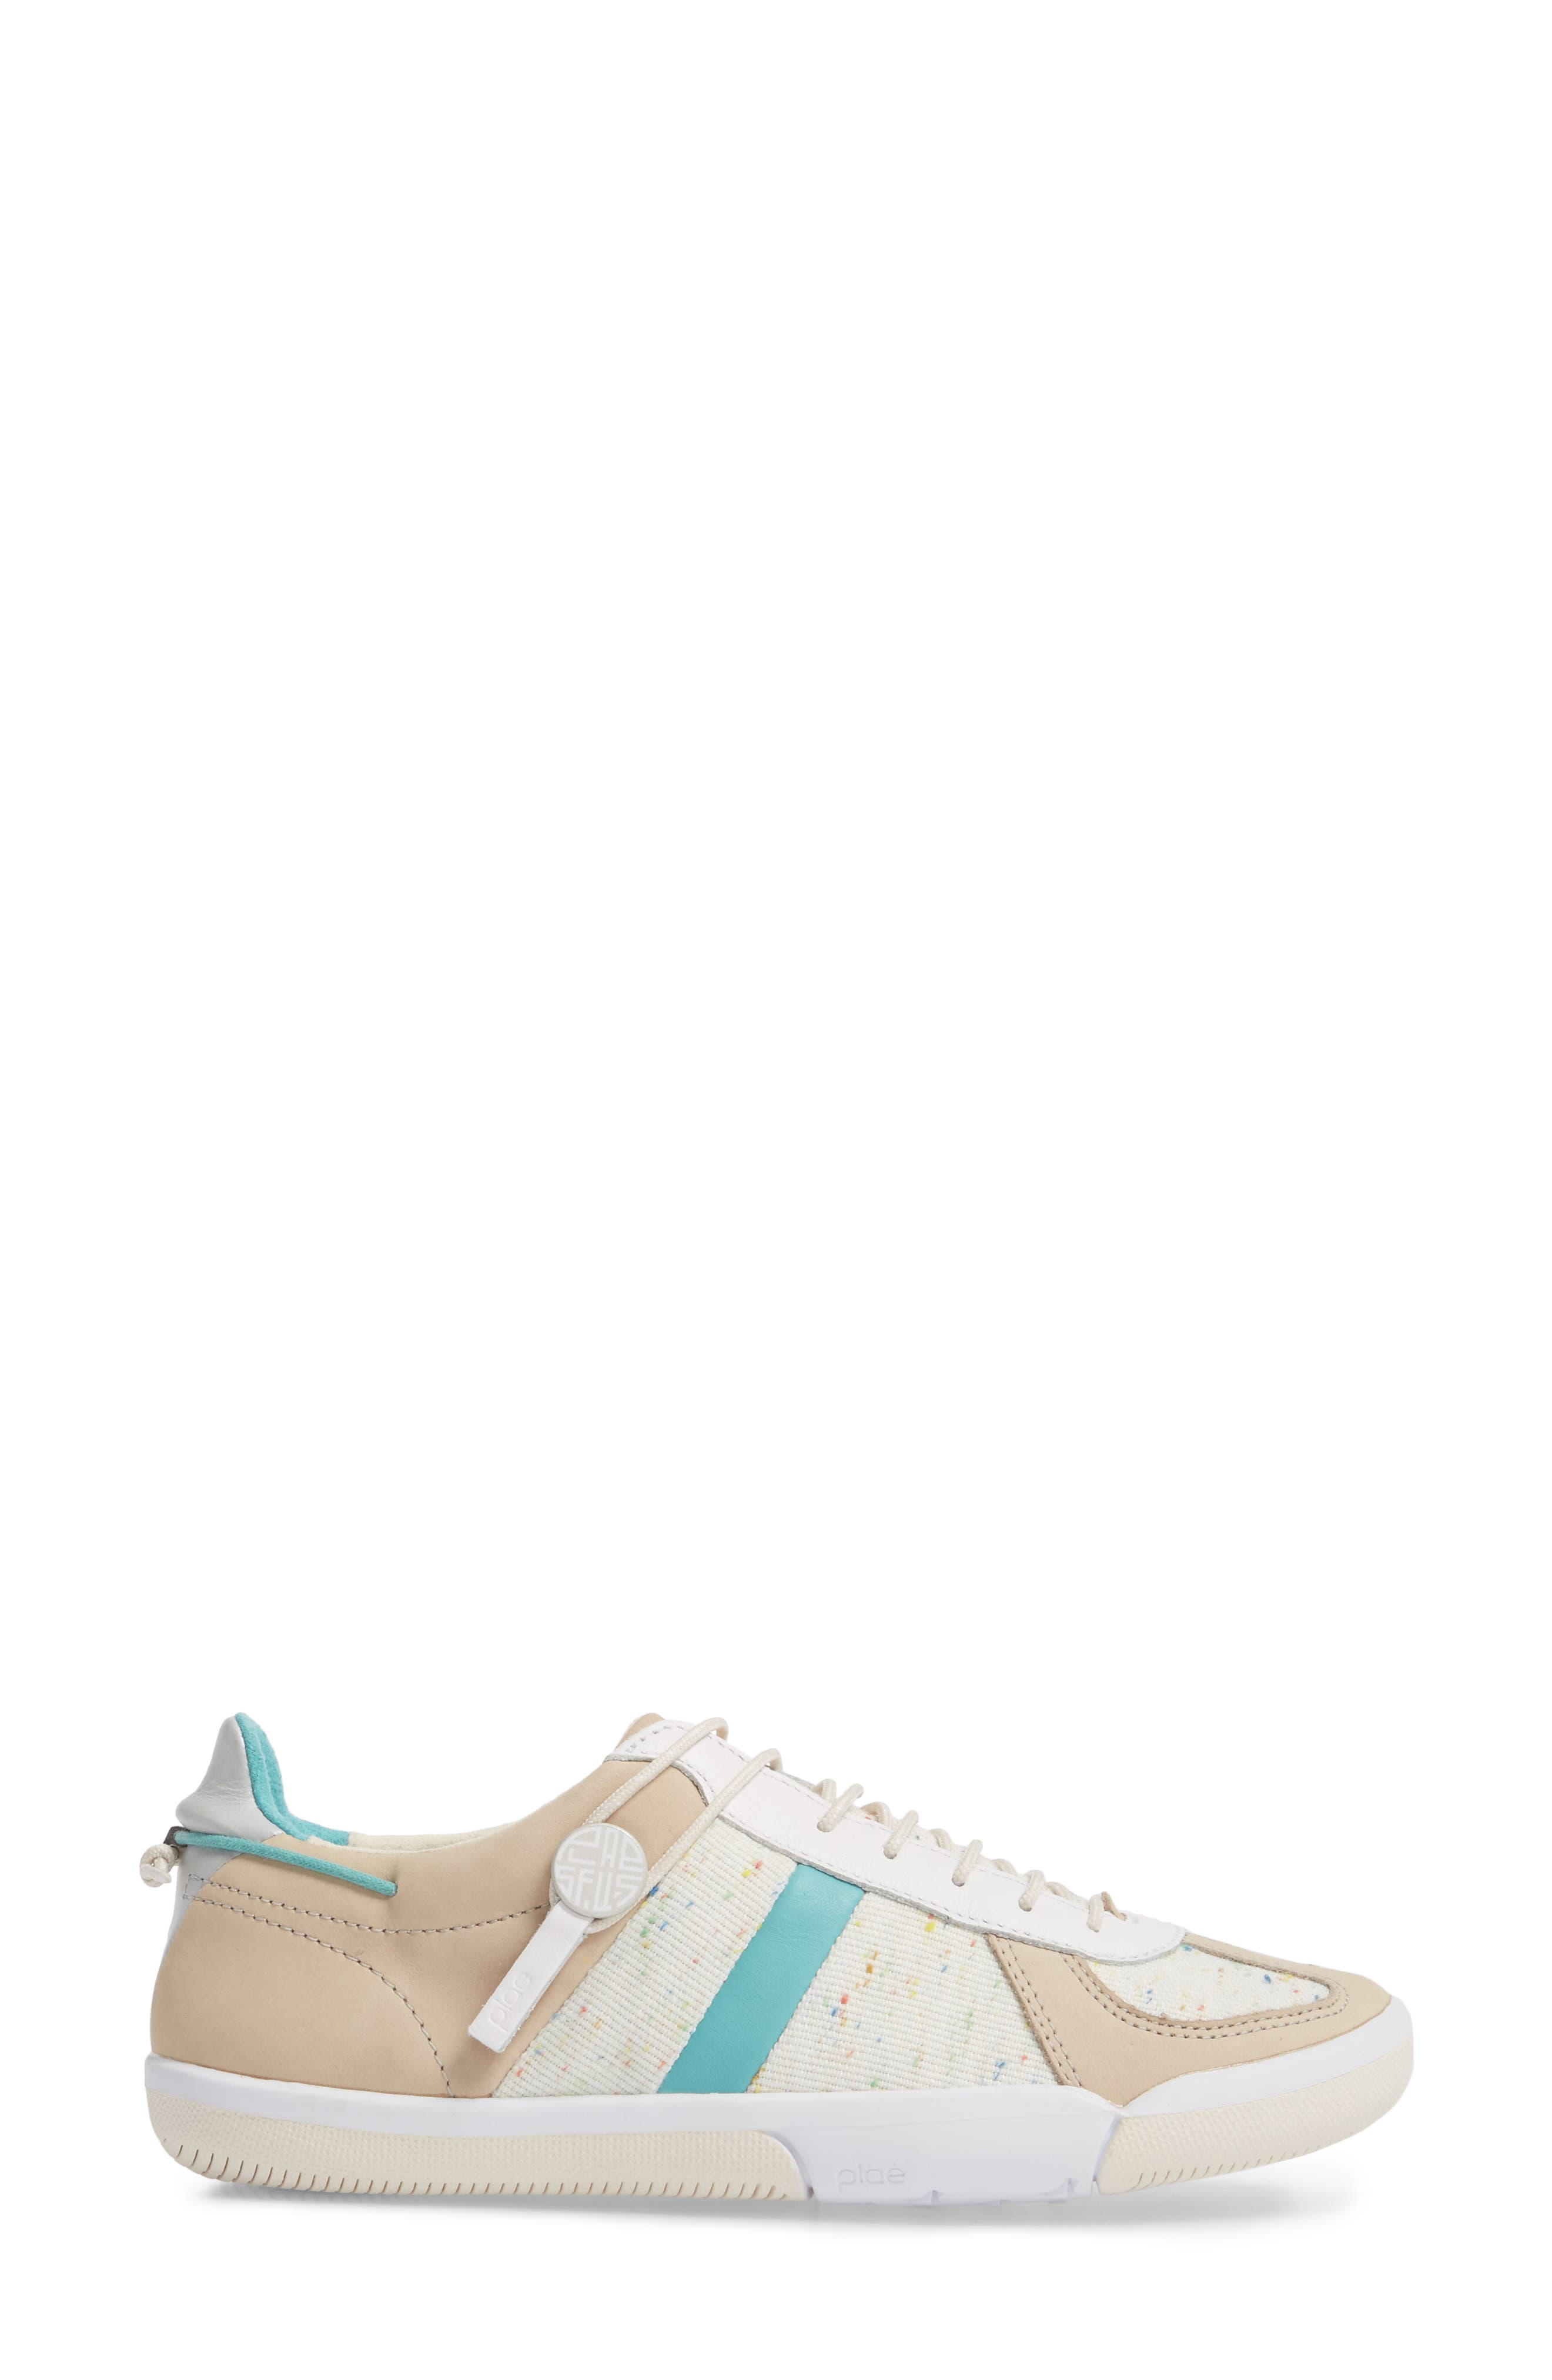 Butler Sneaker,                             Alternate thumbnail 3, color,                             Turtledove Leather